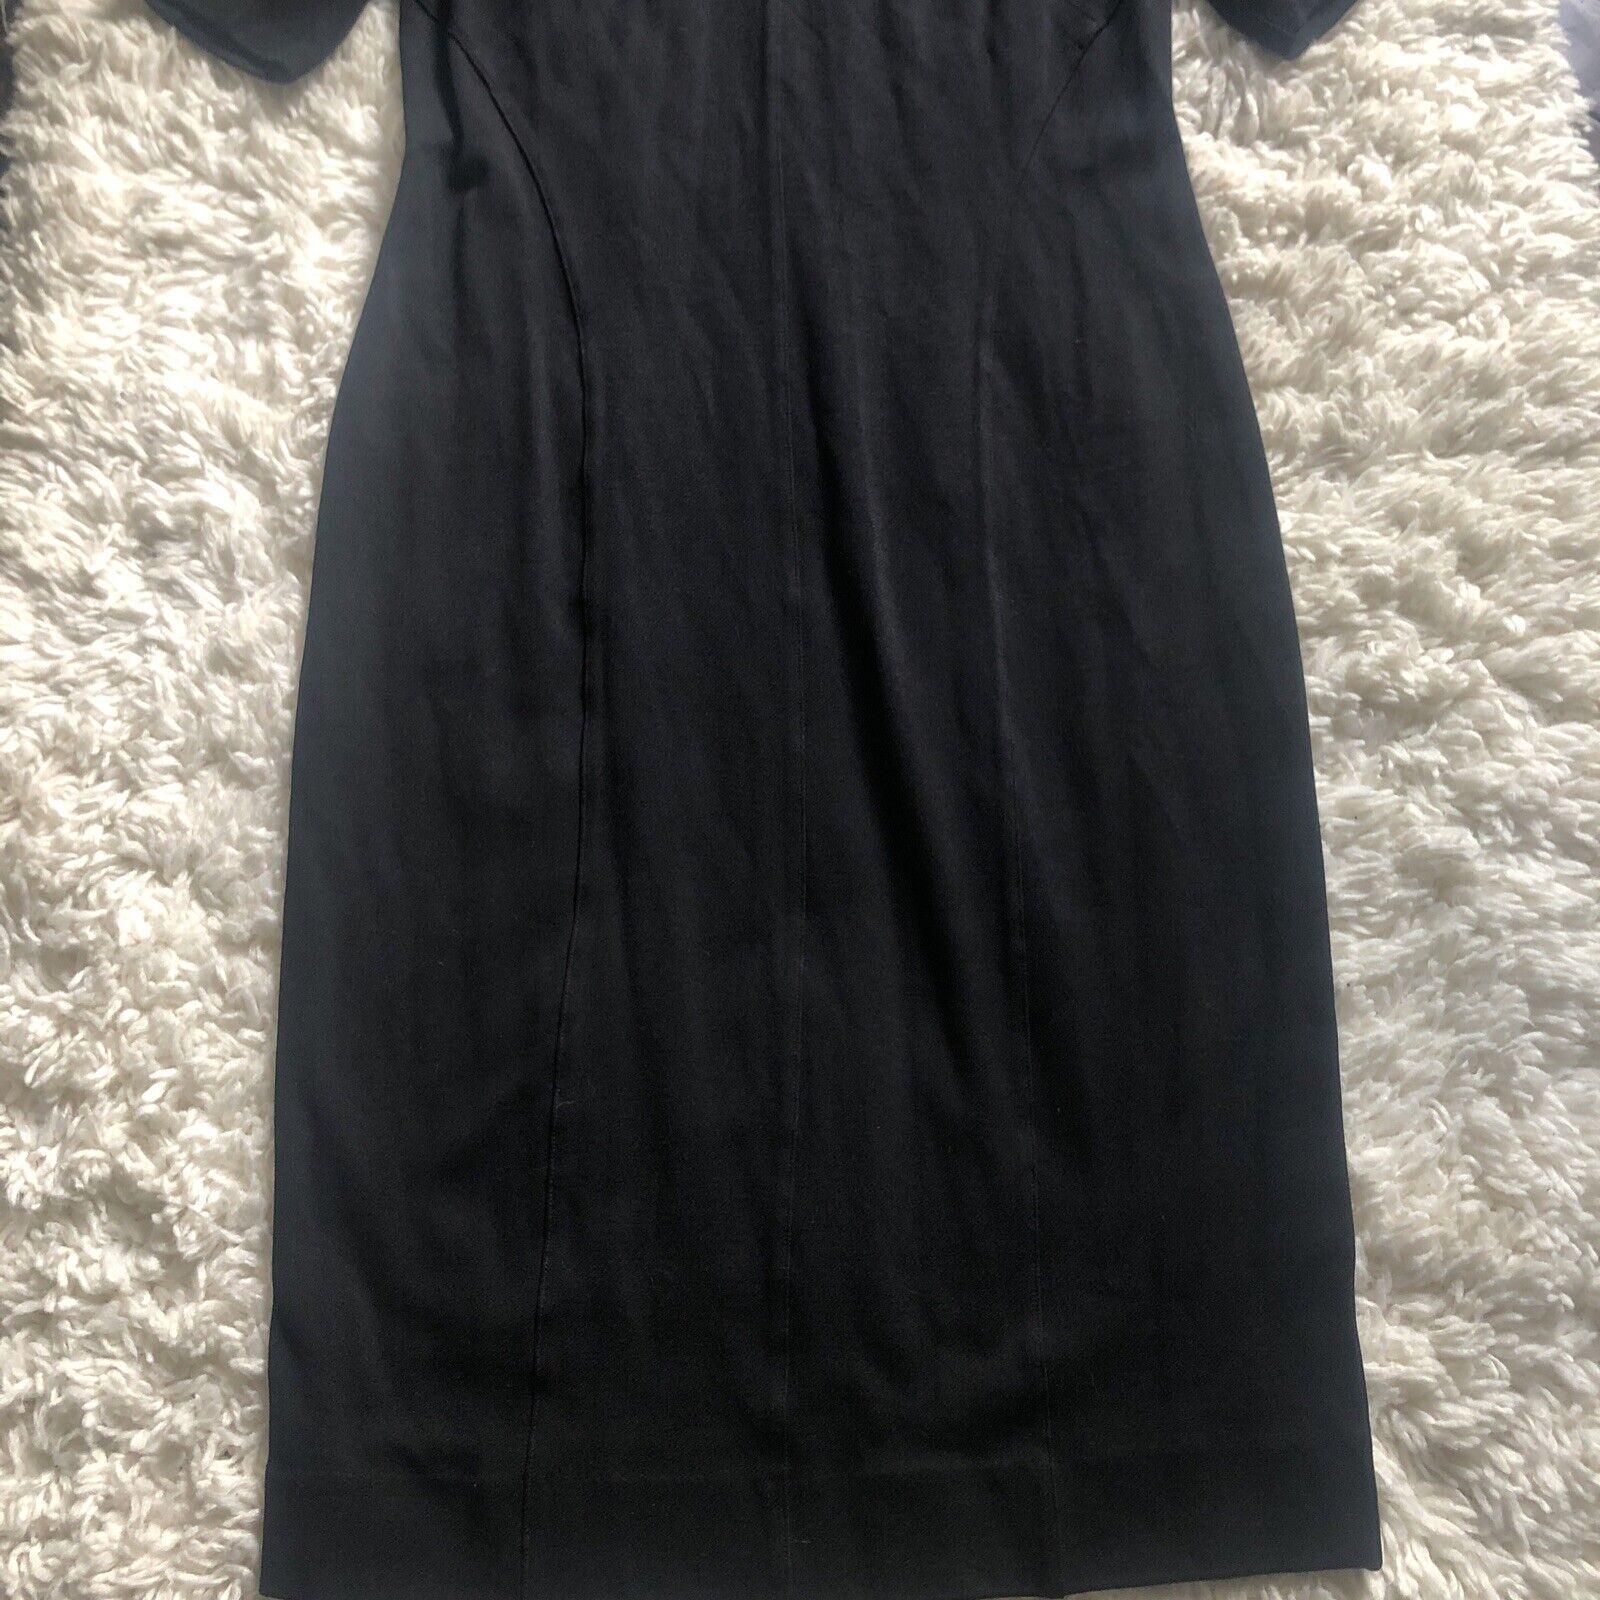 Cabi Claire Modern Sheath Dress q Black Ponte Kni… - image 3